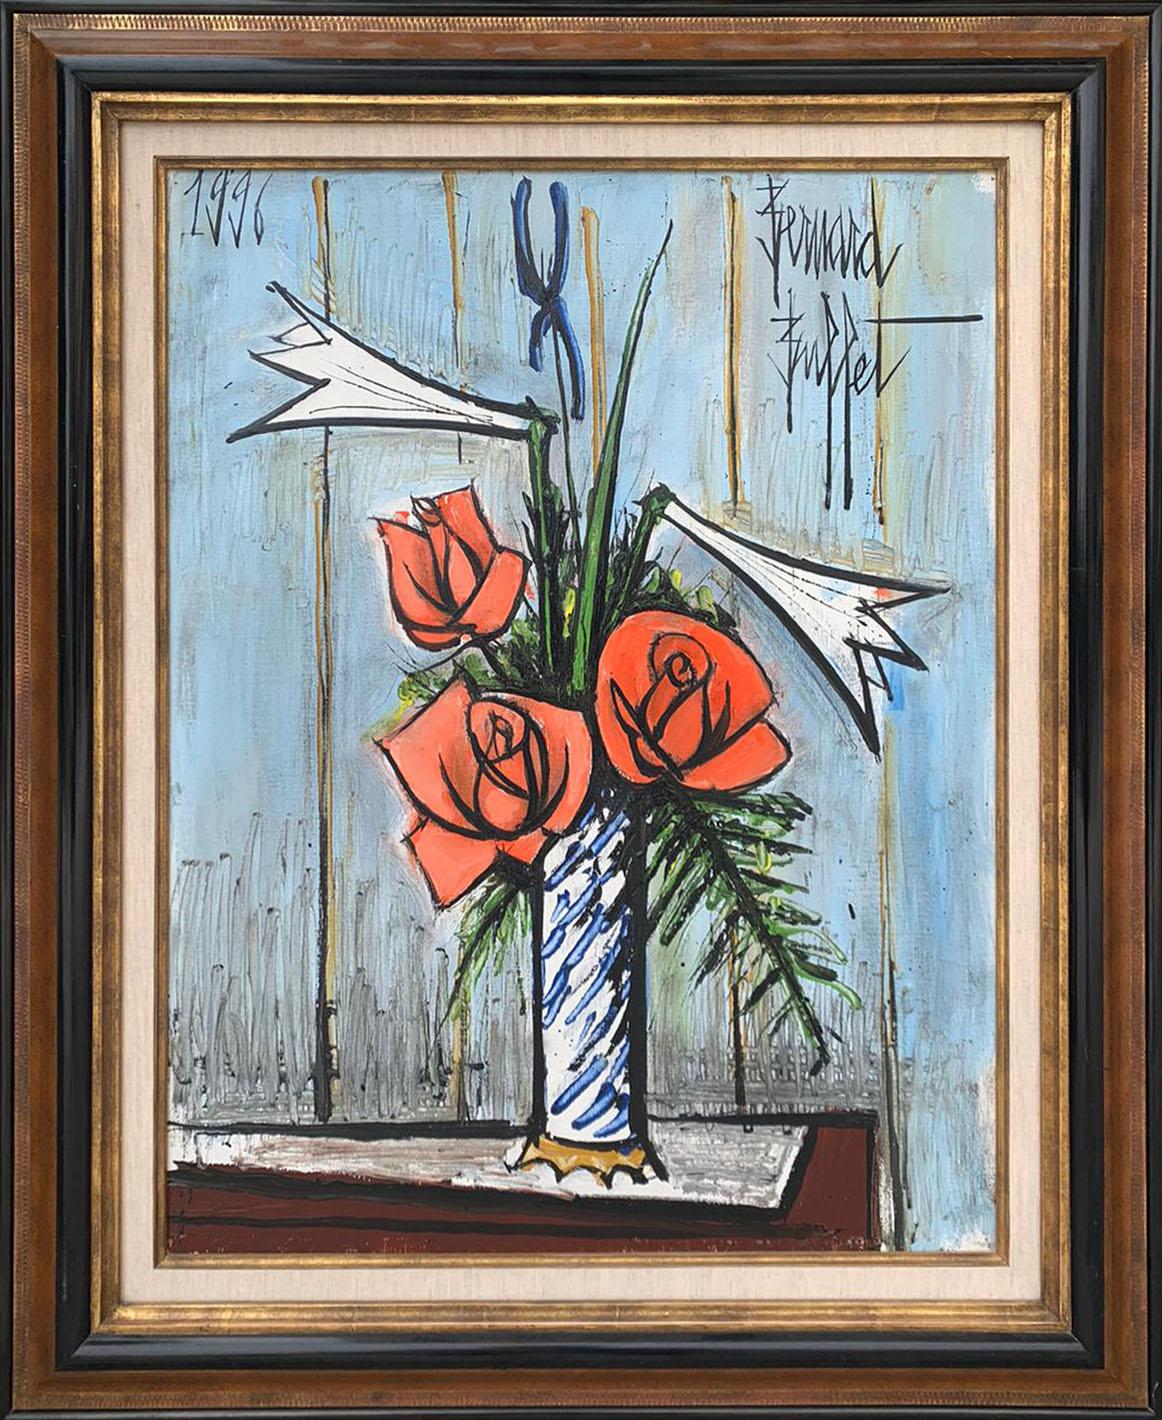 Roses, Lys, Iris - 65x50